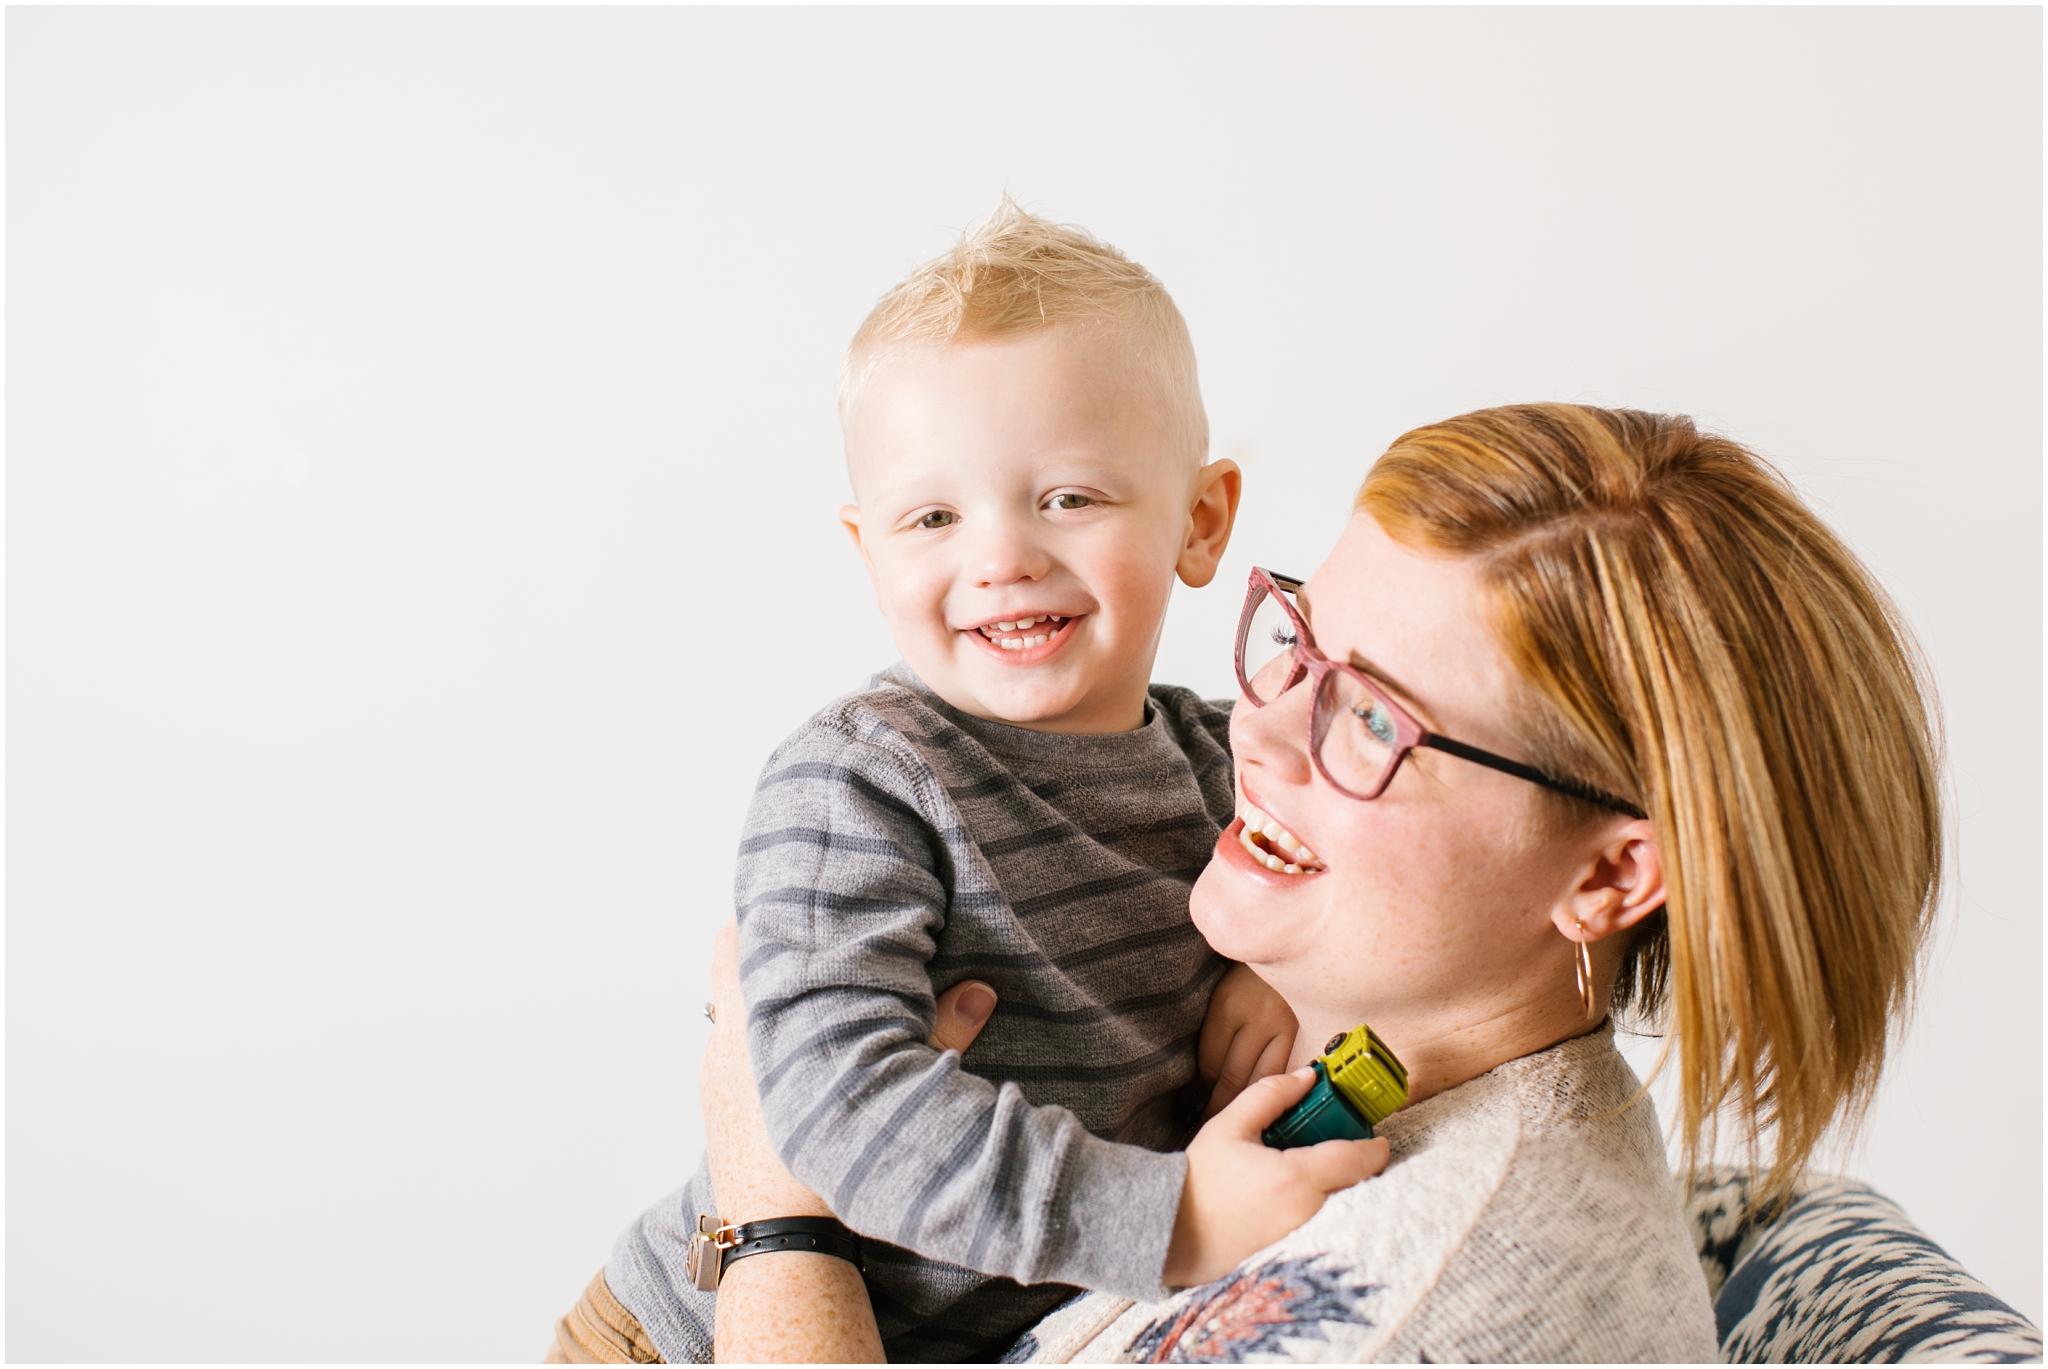 MommyandMe-45_Lizzie-B-Imagery-Utah-Family-Photographer-Mommy-and-Me-Utah-County-Salt-Lake-City-Park-City.jpg